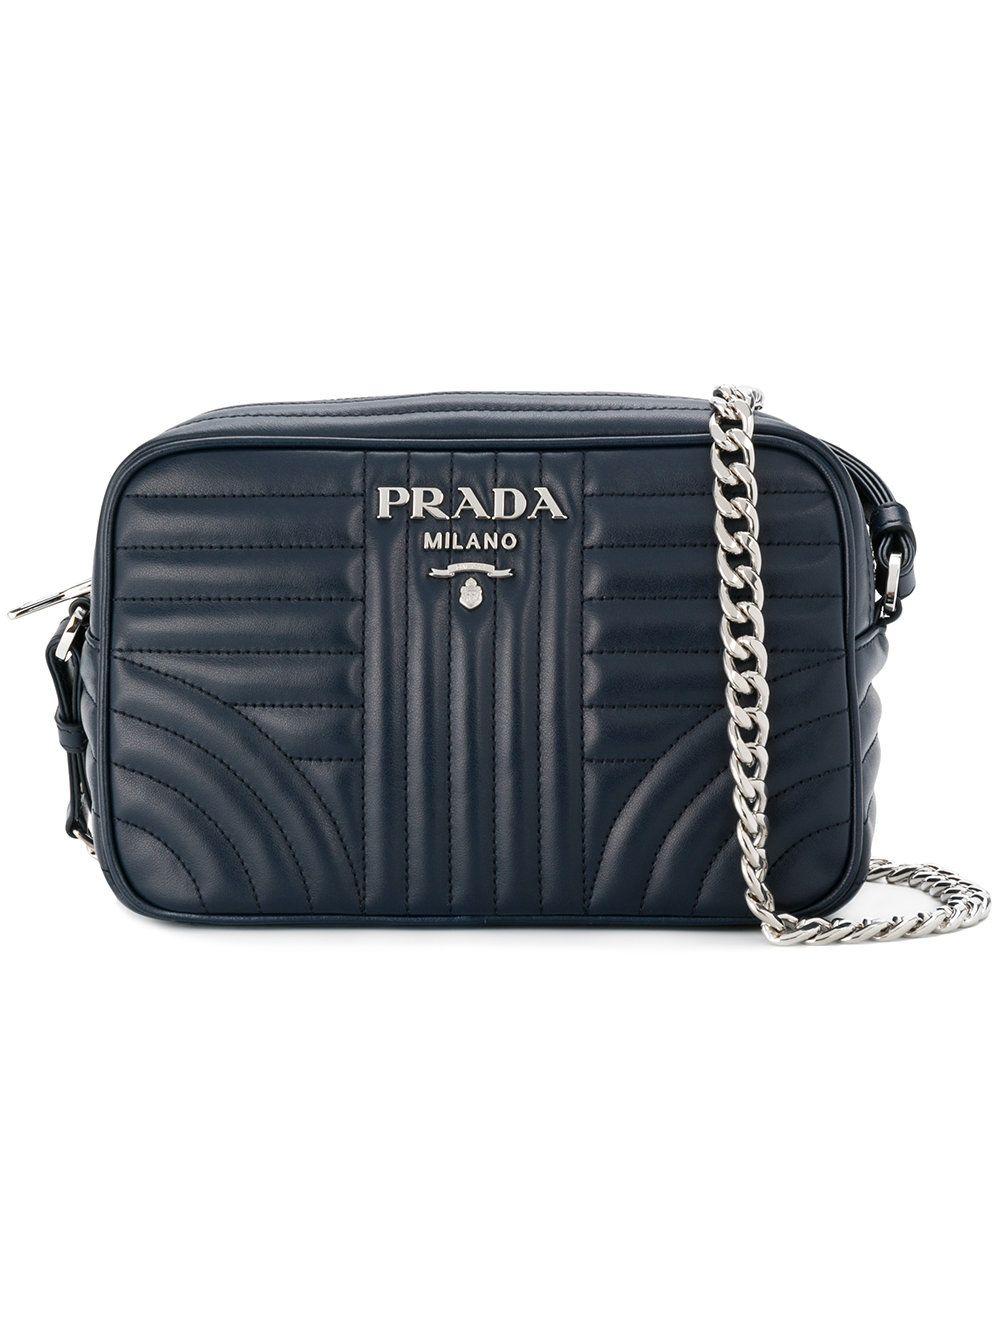 Cheap Footlocker matelassé shoulder bag - Black Prada Free Shipping Footlocker Best Authentic Sneakernews Online 5rBVce